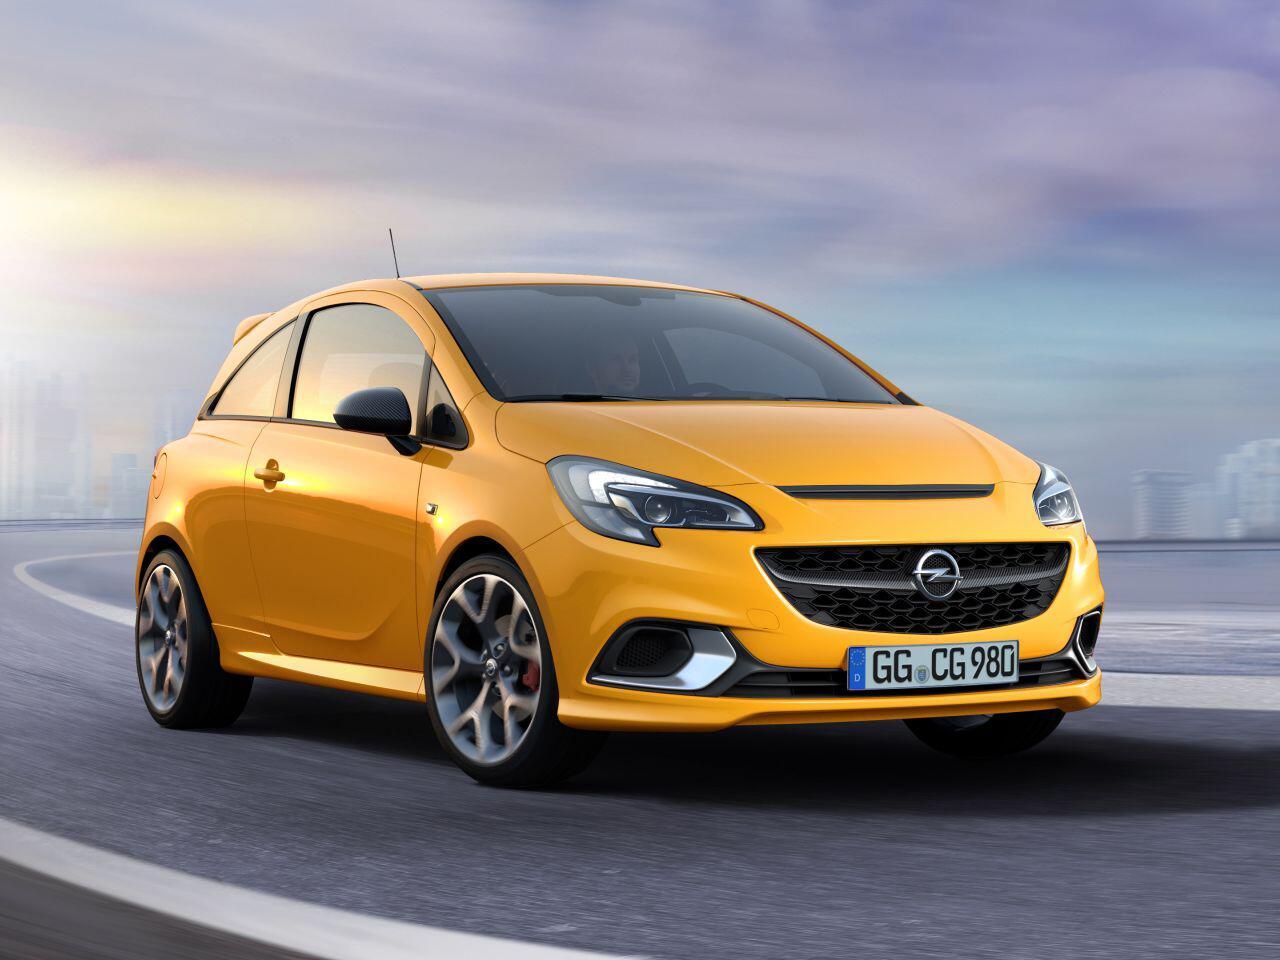 Bild zu Platz 15: Opel Corsa